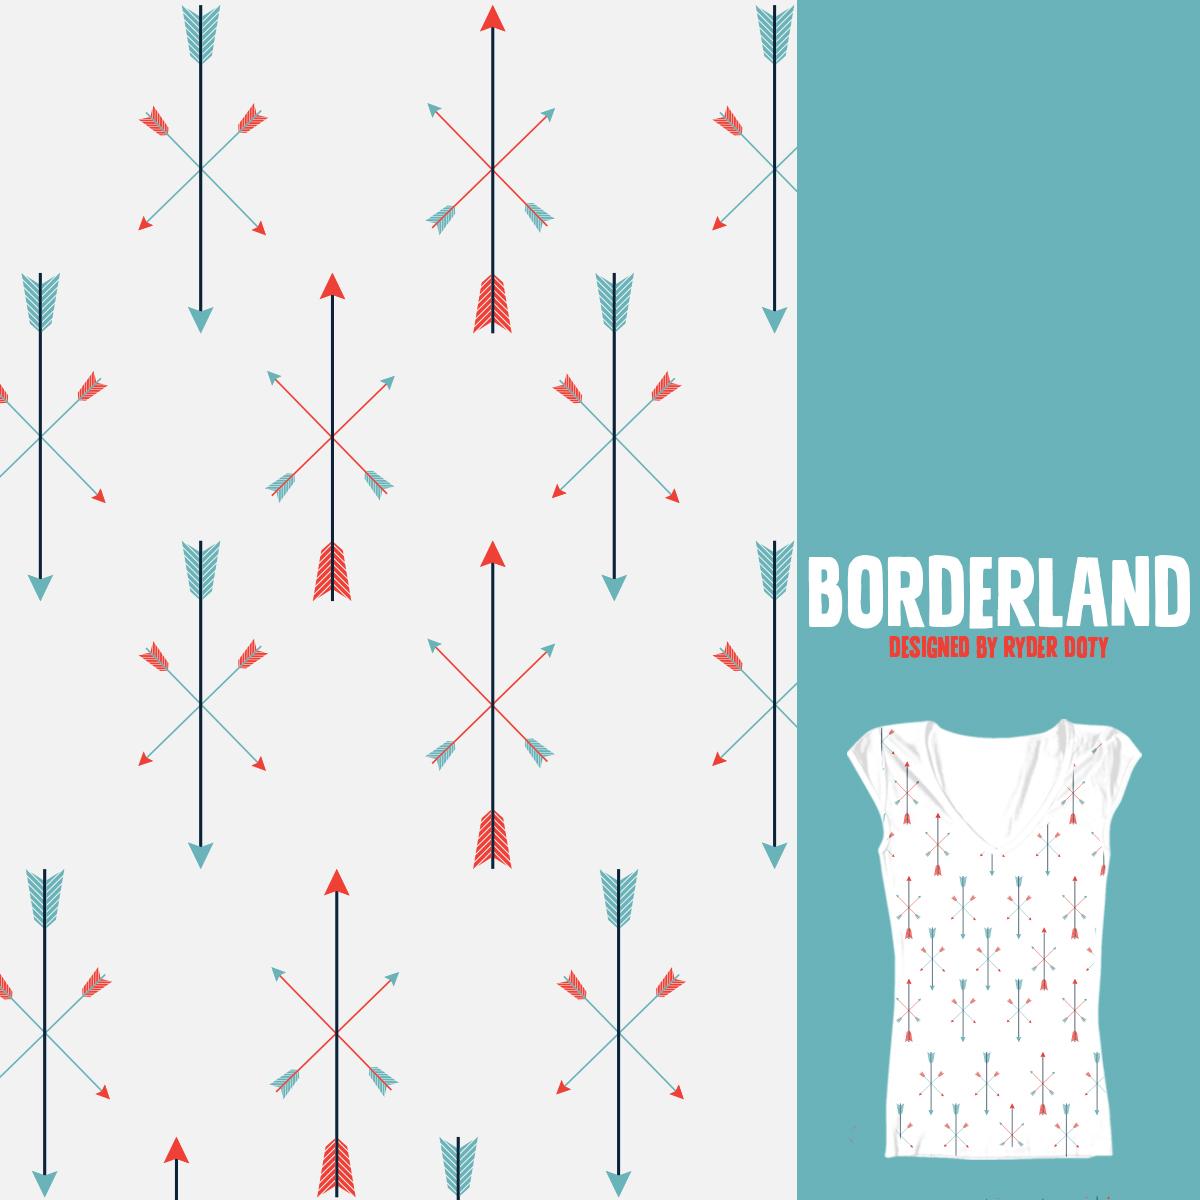 BORDERLAND by Ryder on Threadless